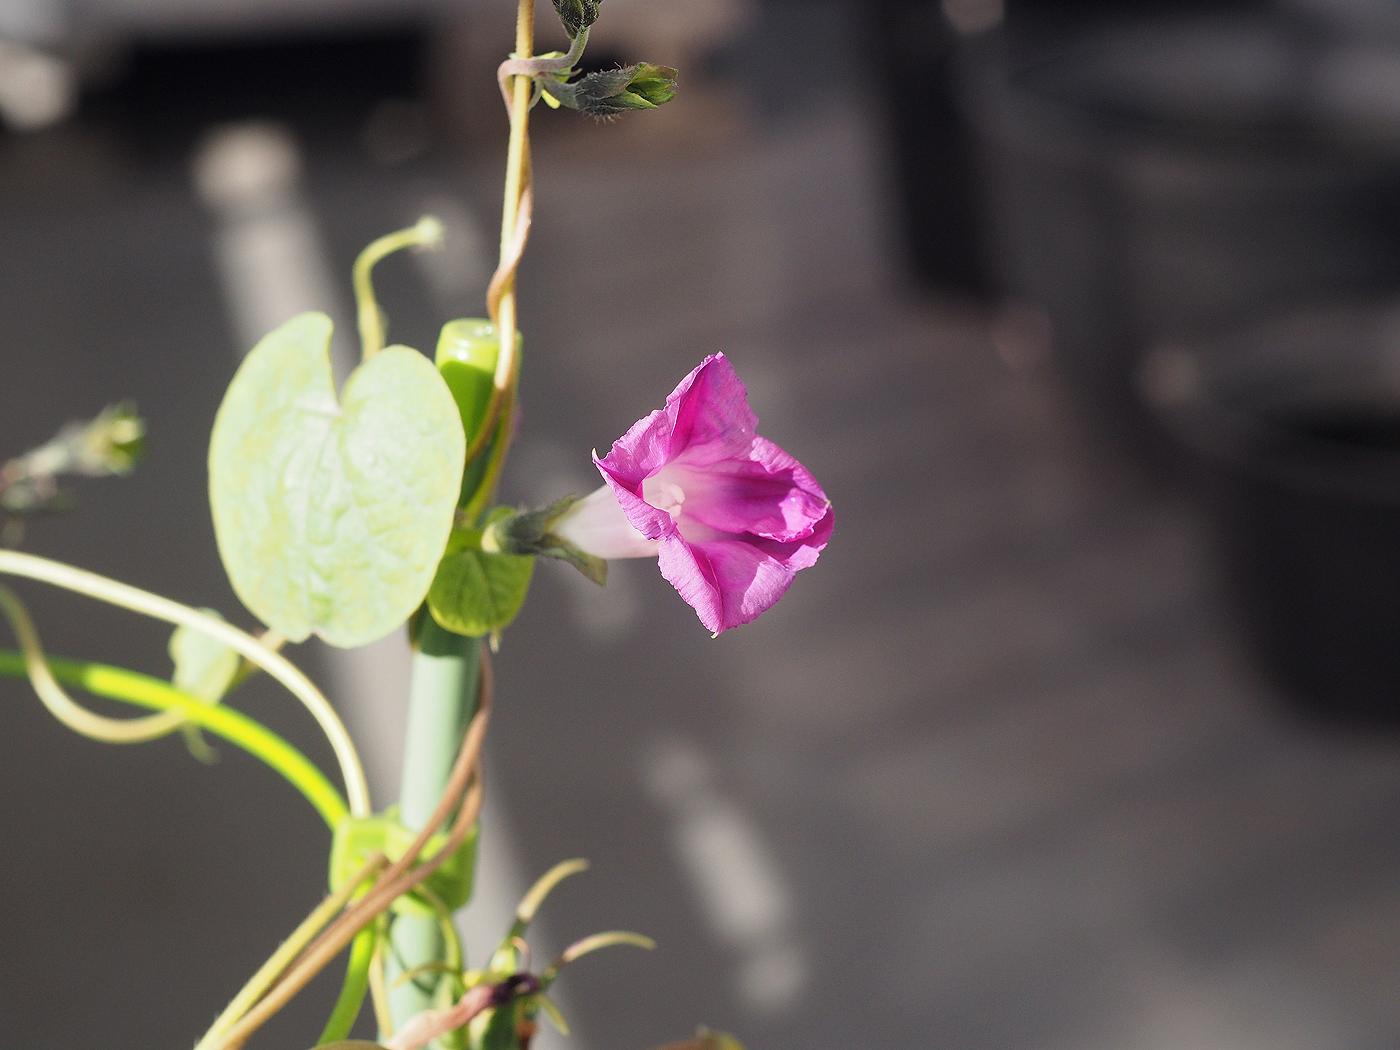 秋植え朝顔、花26、92日目